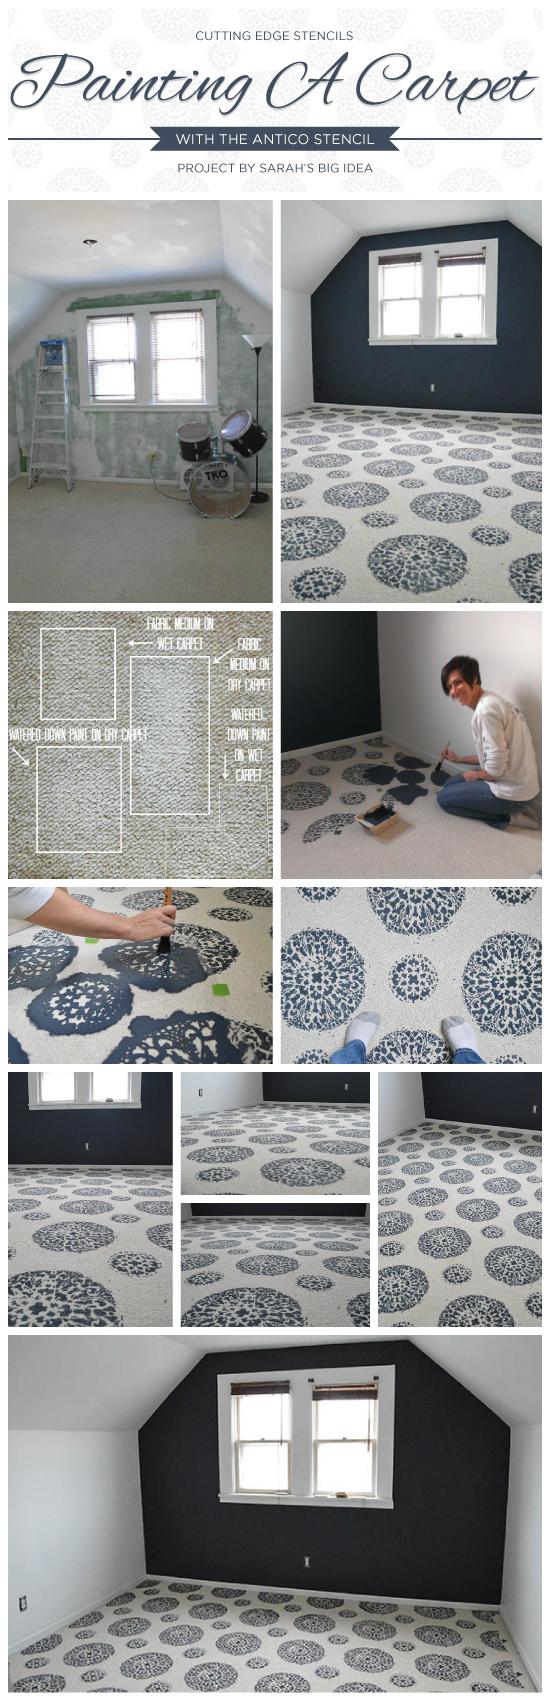 Carpet With The Antico Stencil